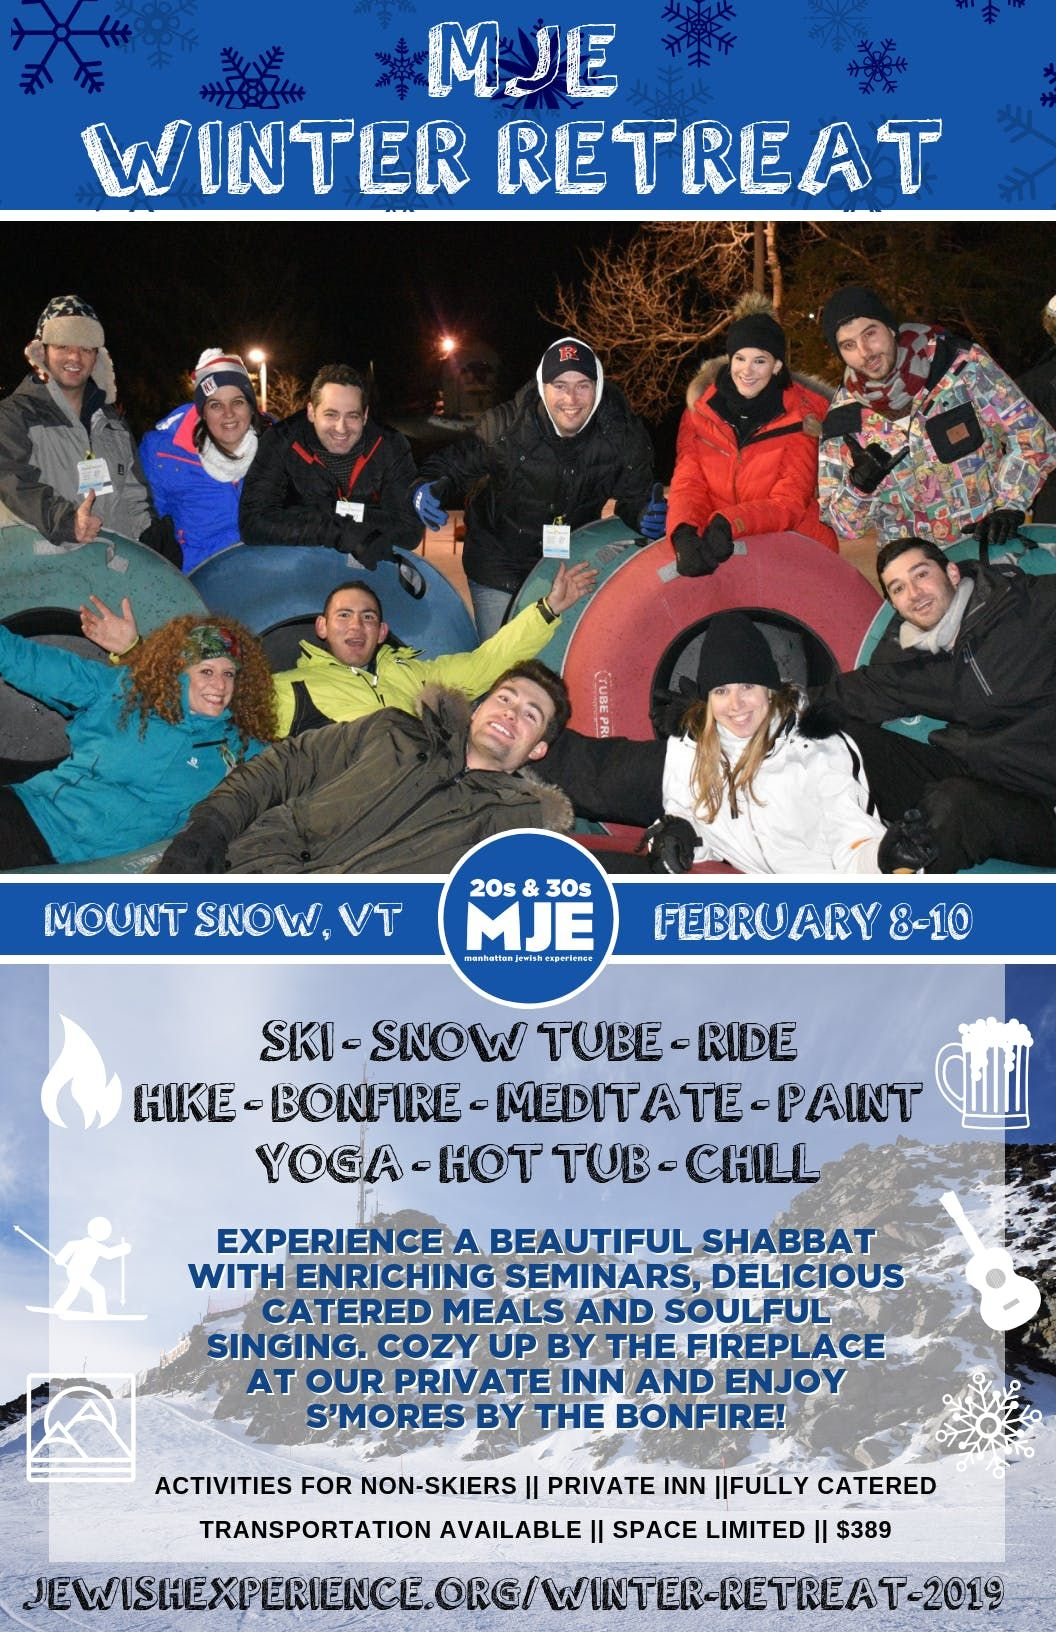 MJE 20s & 30s Winter Retreat 2019 Shabbat & Ski Weekend in Mount Snow Vermont